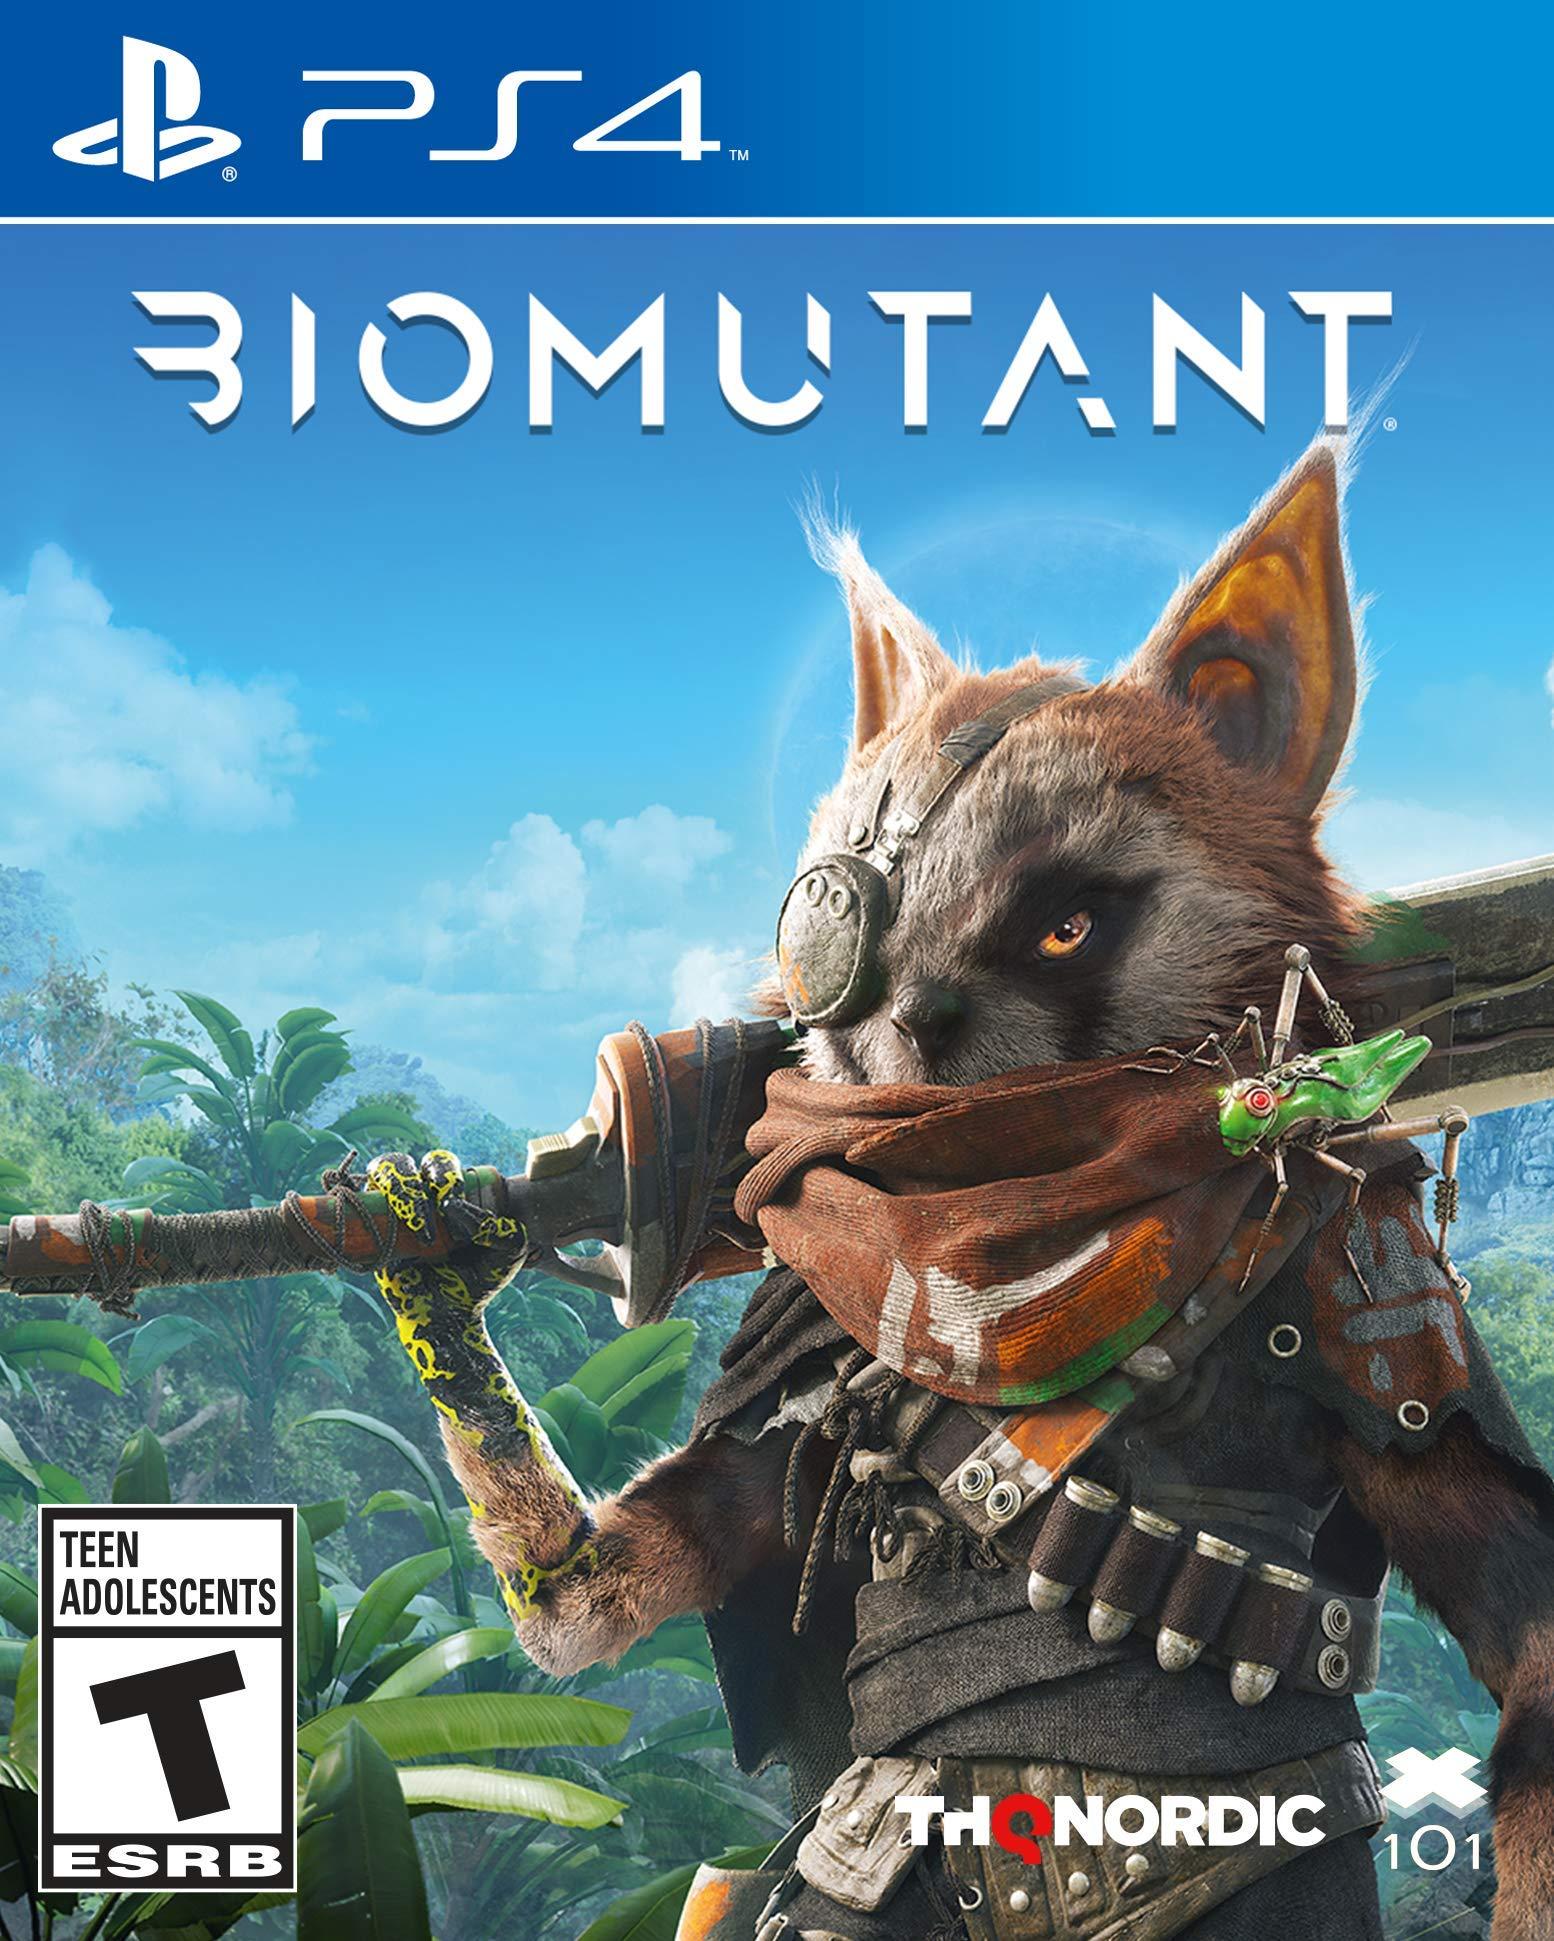 Poster. Biomutant